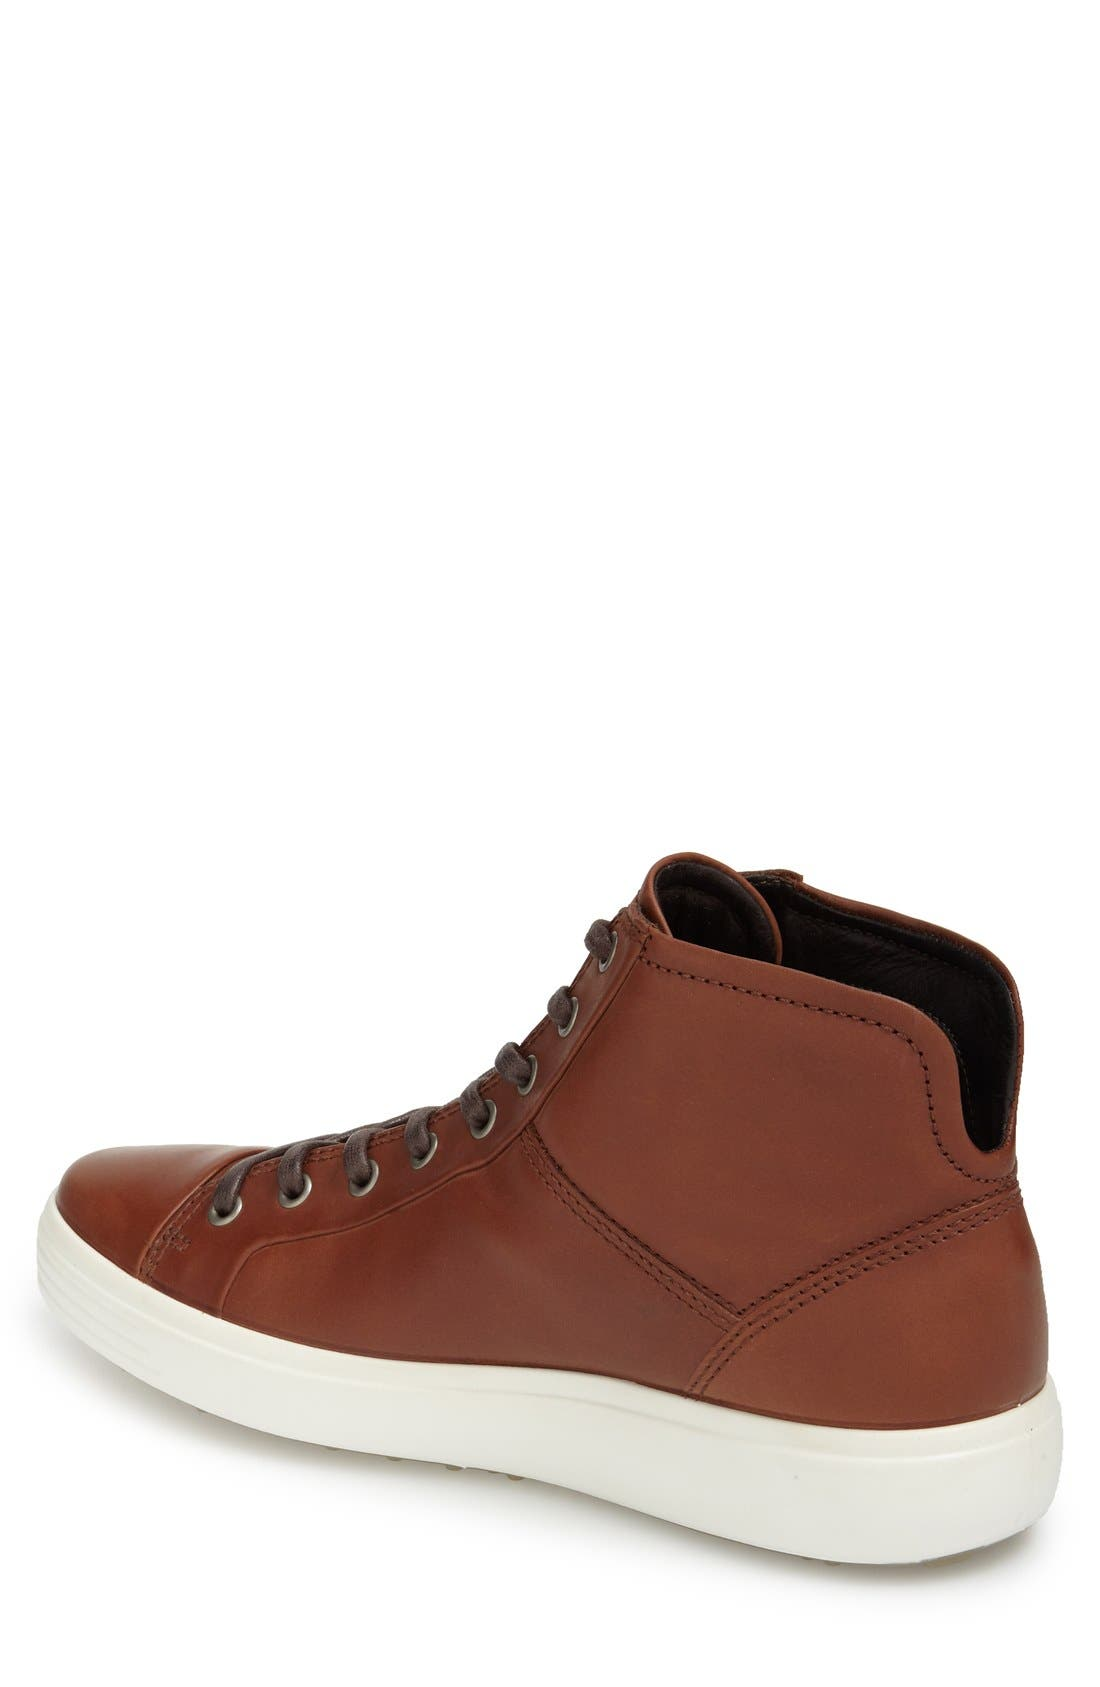 Alternate Image 2  - ECCO 'Soft 7' High Top Sneaker (Men)